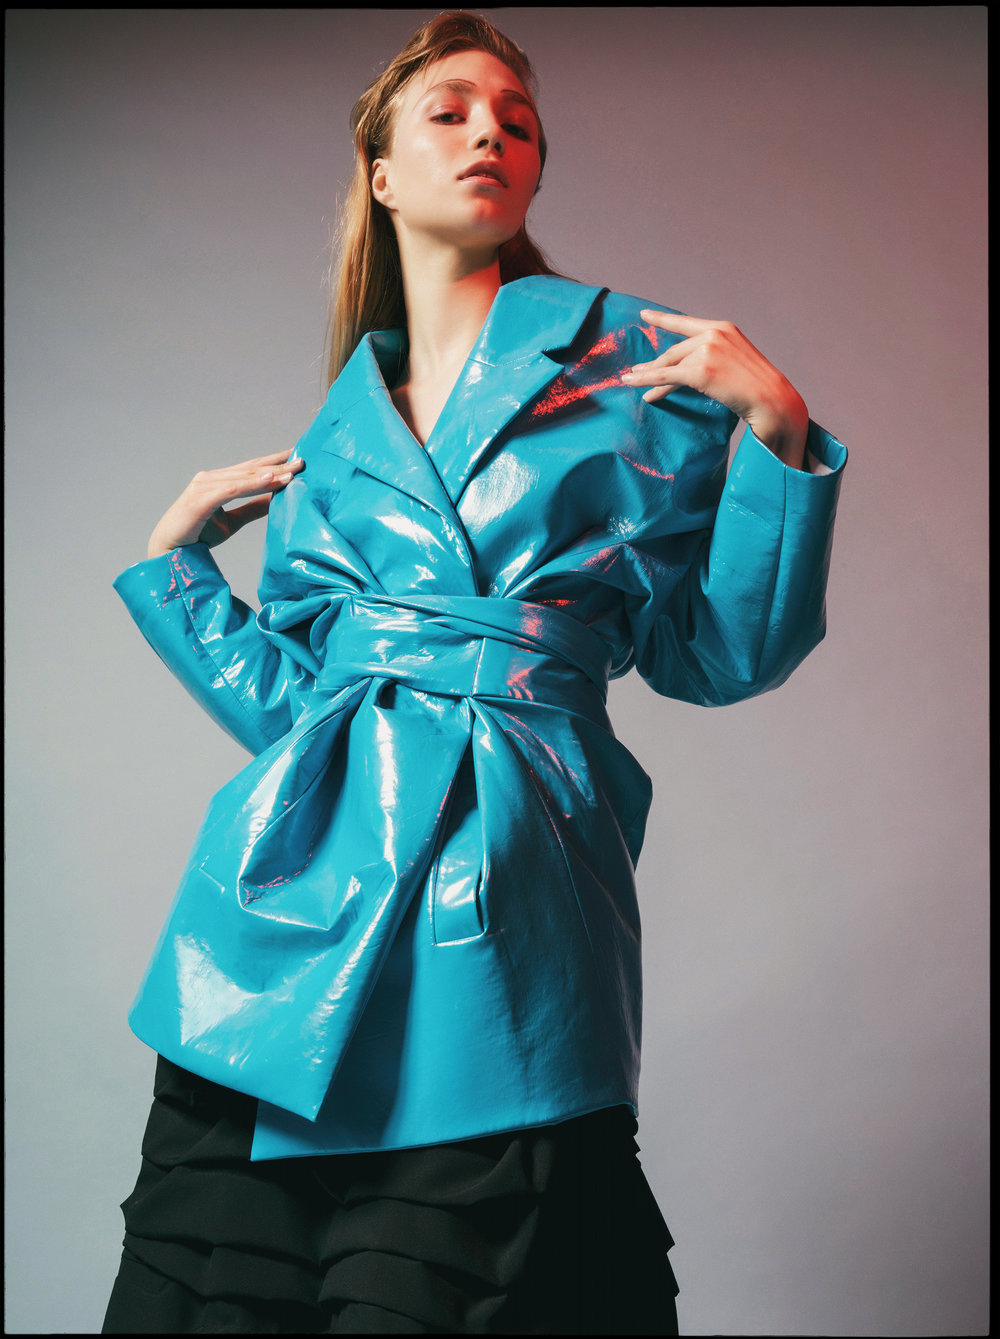 jacket RAD HOURANI, shorts COMME DES GARÇON available at  Holt Renfrew ,